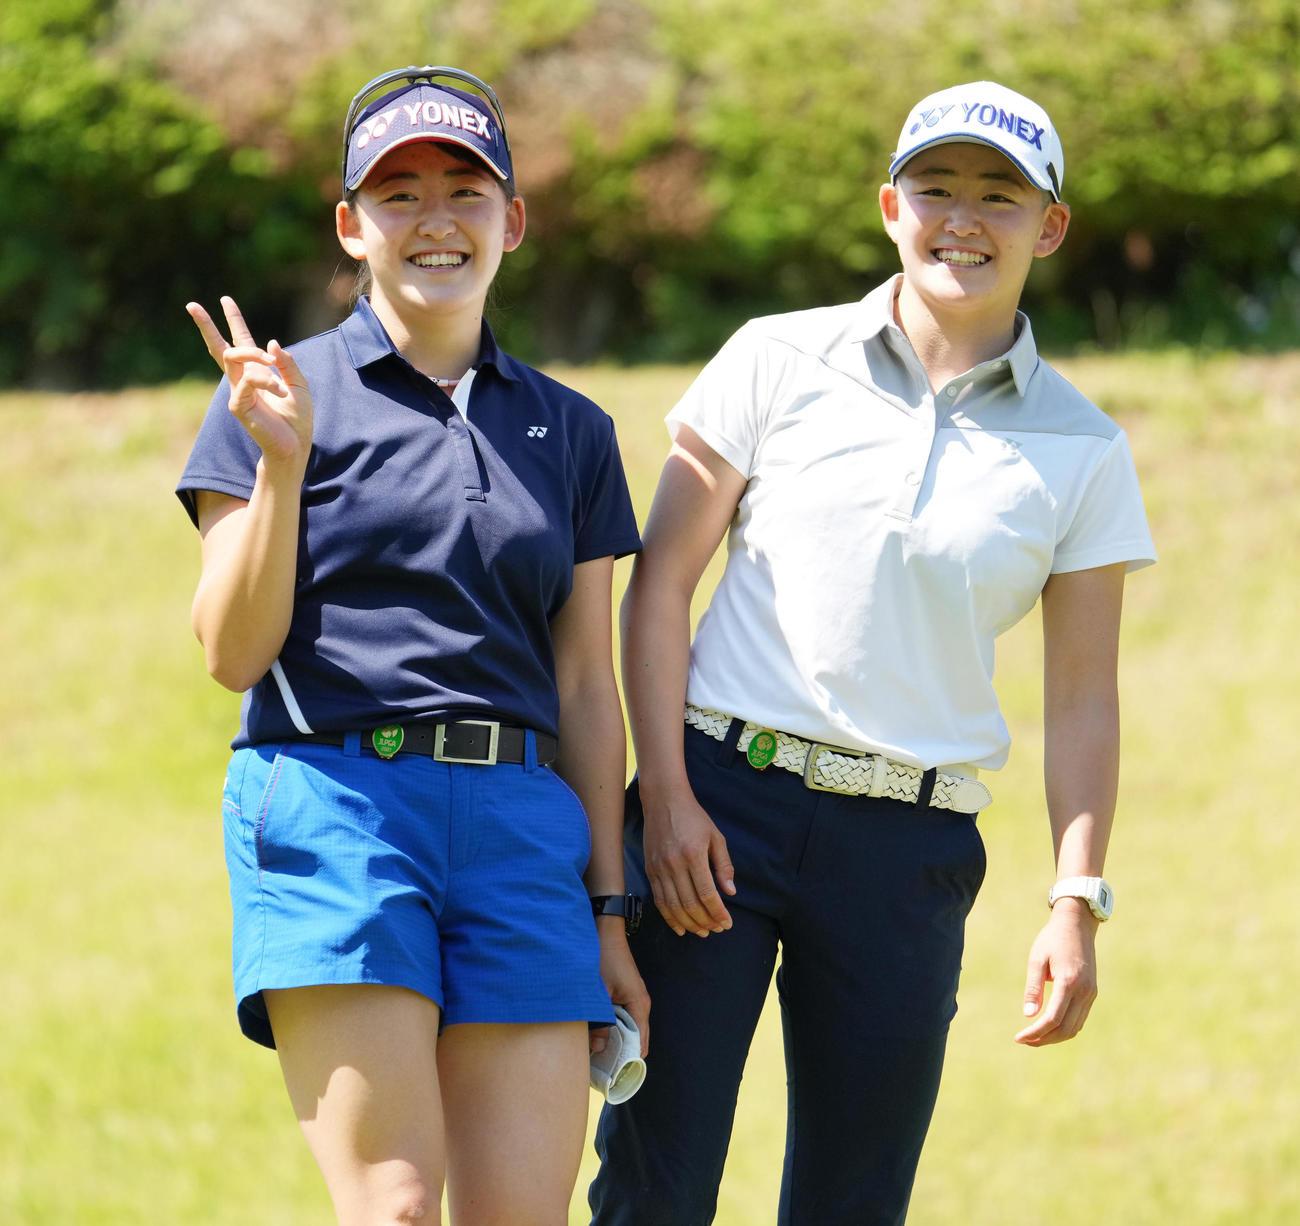 岩井姉妹の姉明愛(右)と妹千怜(21年6月9日)